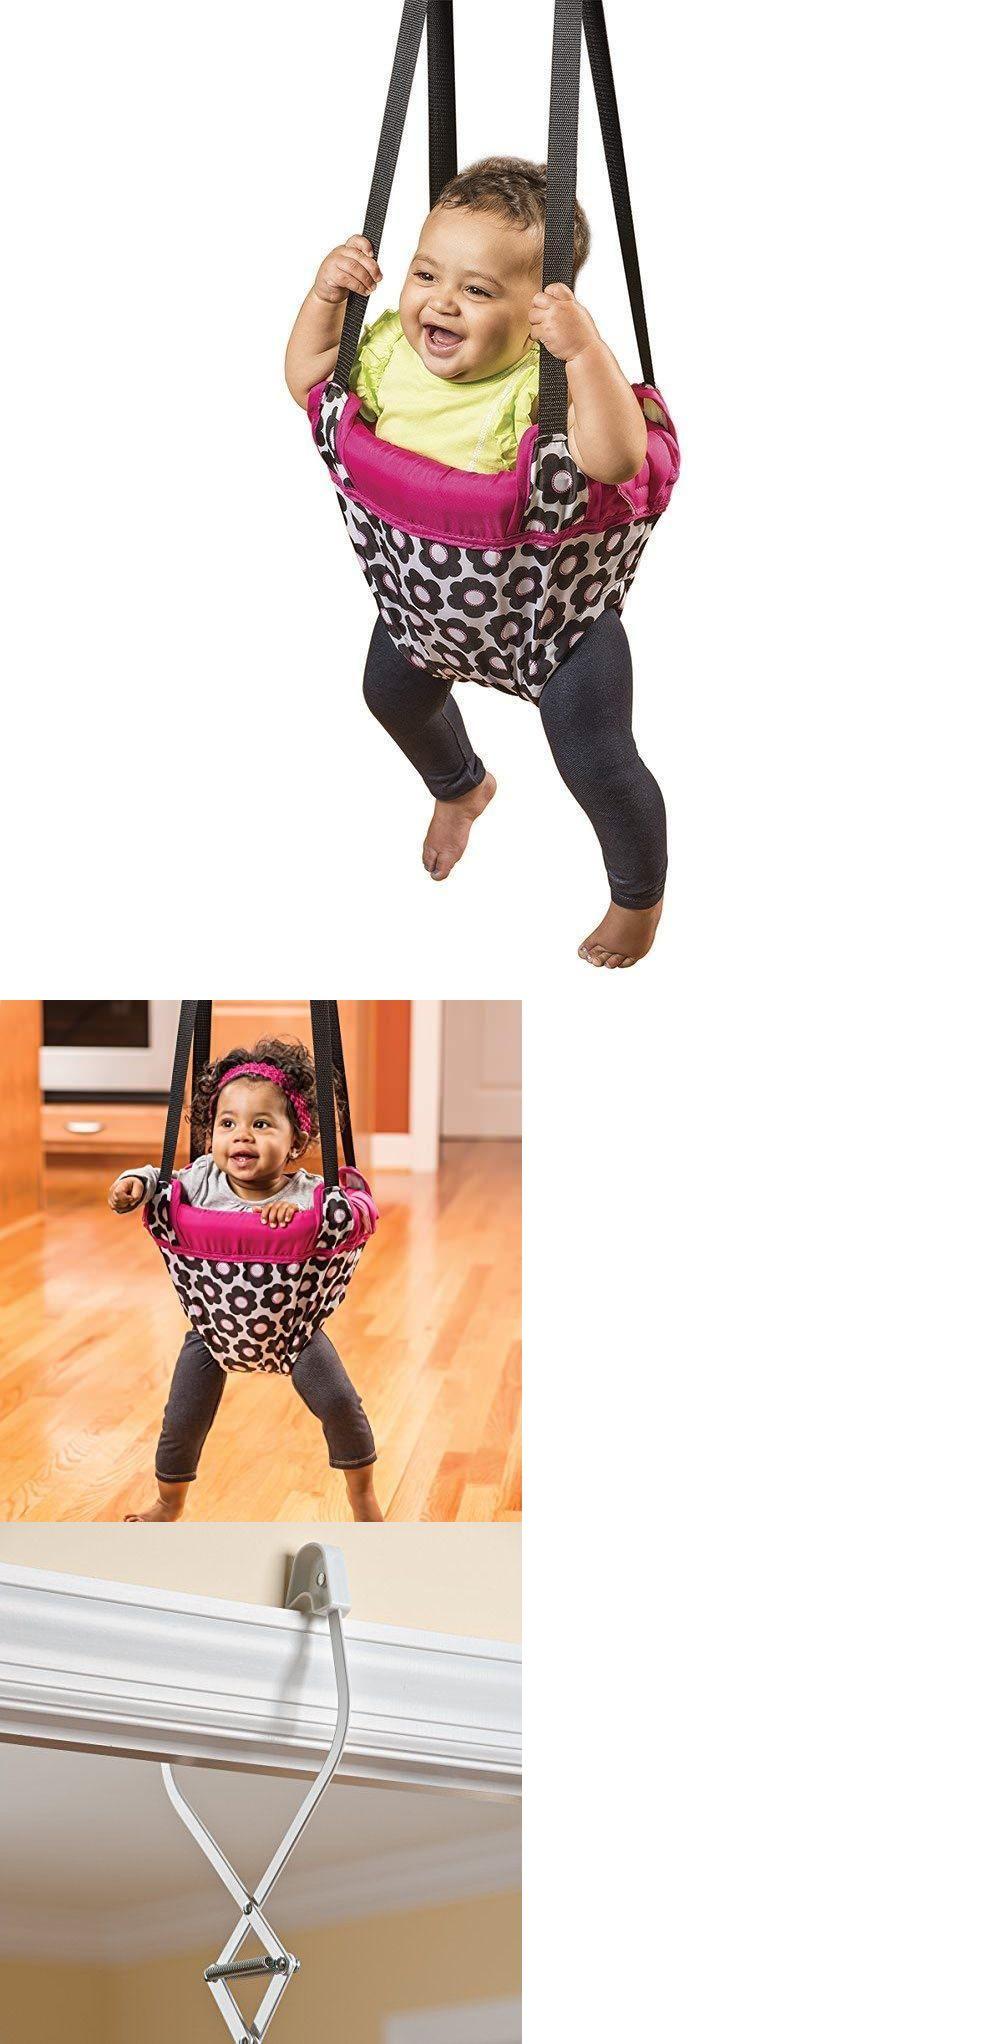 7e74626dbea9 Baby Jumping Exercisers 117032  Evenflo Exersaucer Door Jumper ...